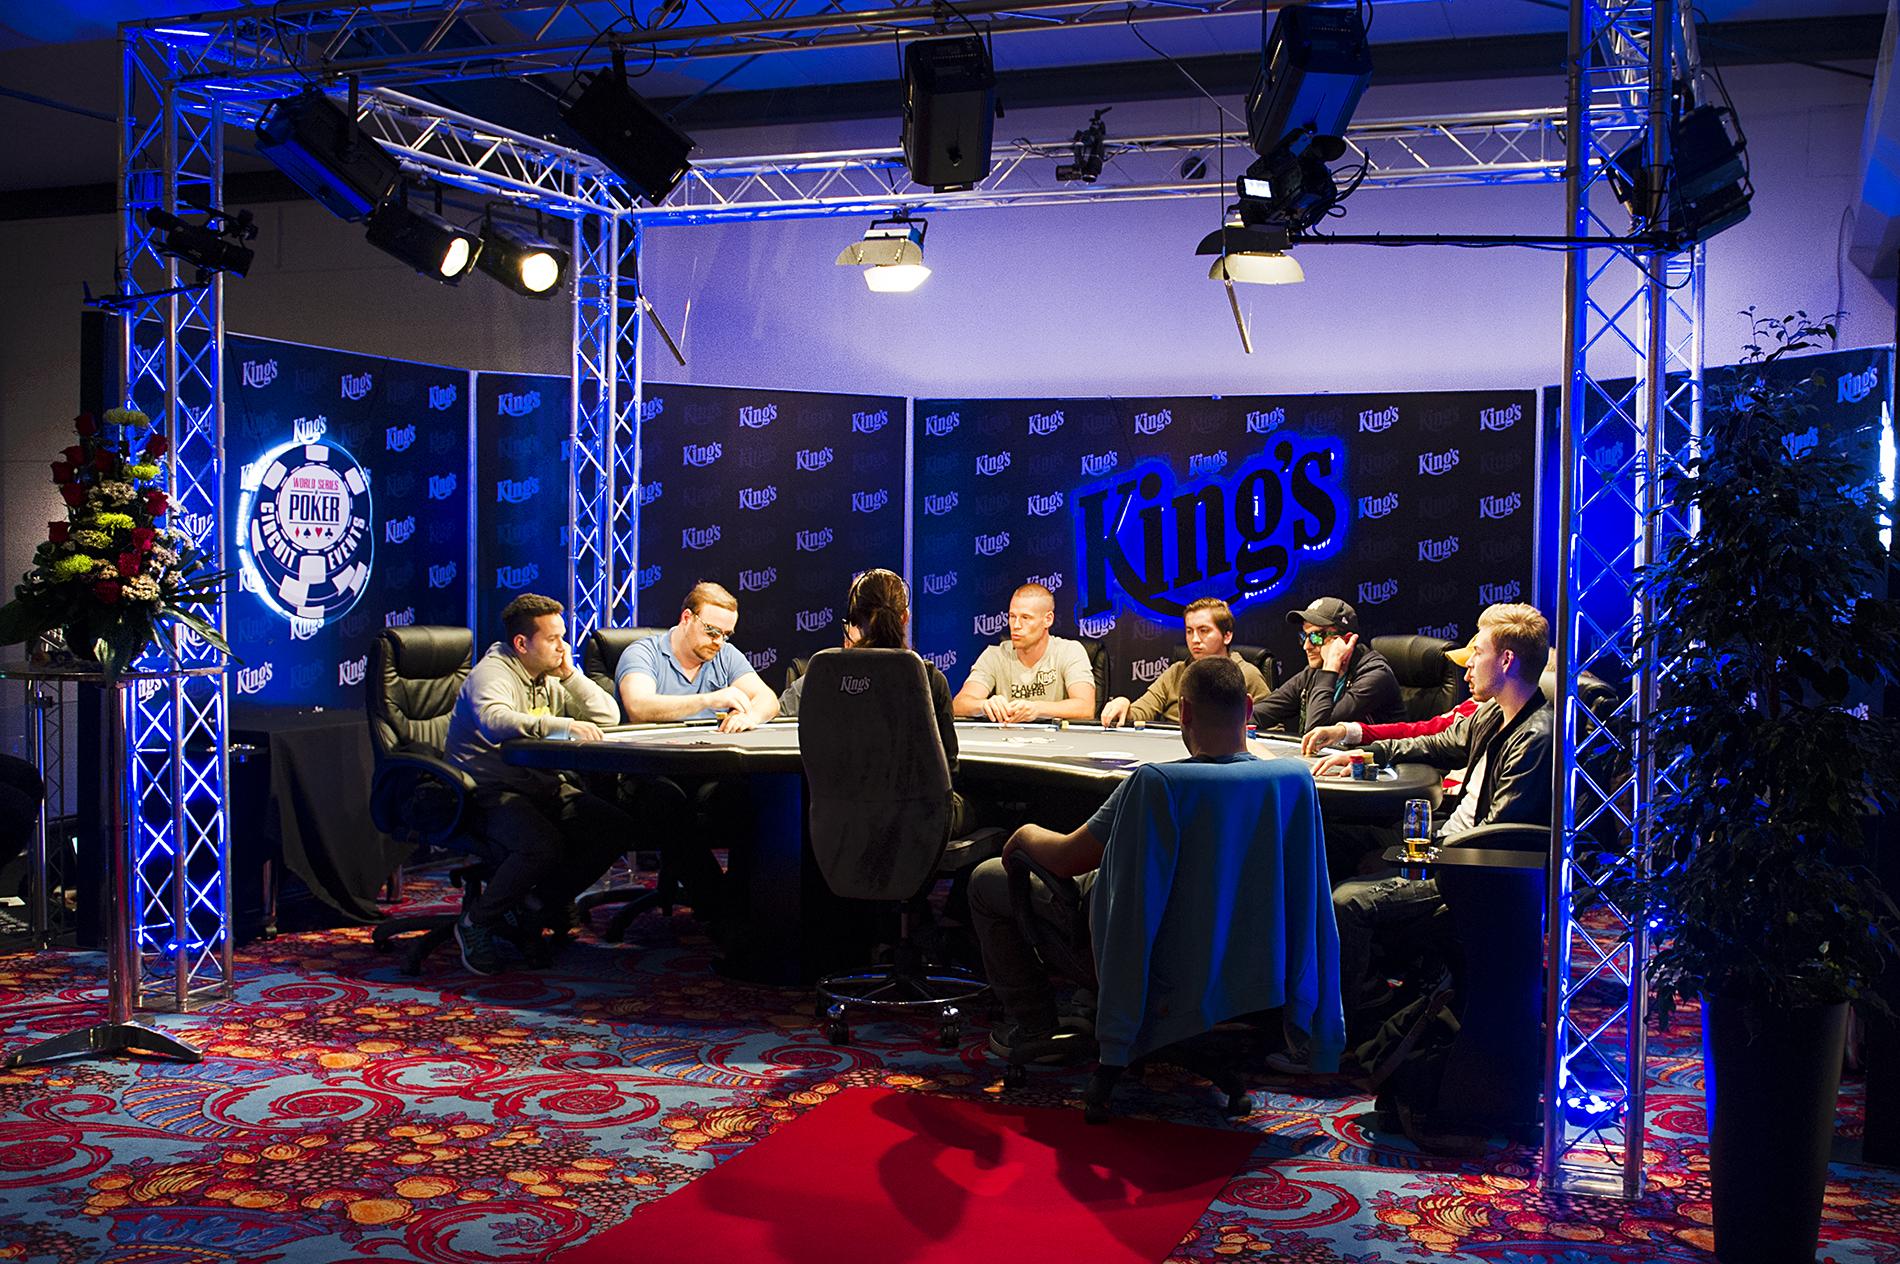 kings casino turnier ergebnisse